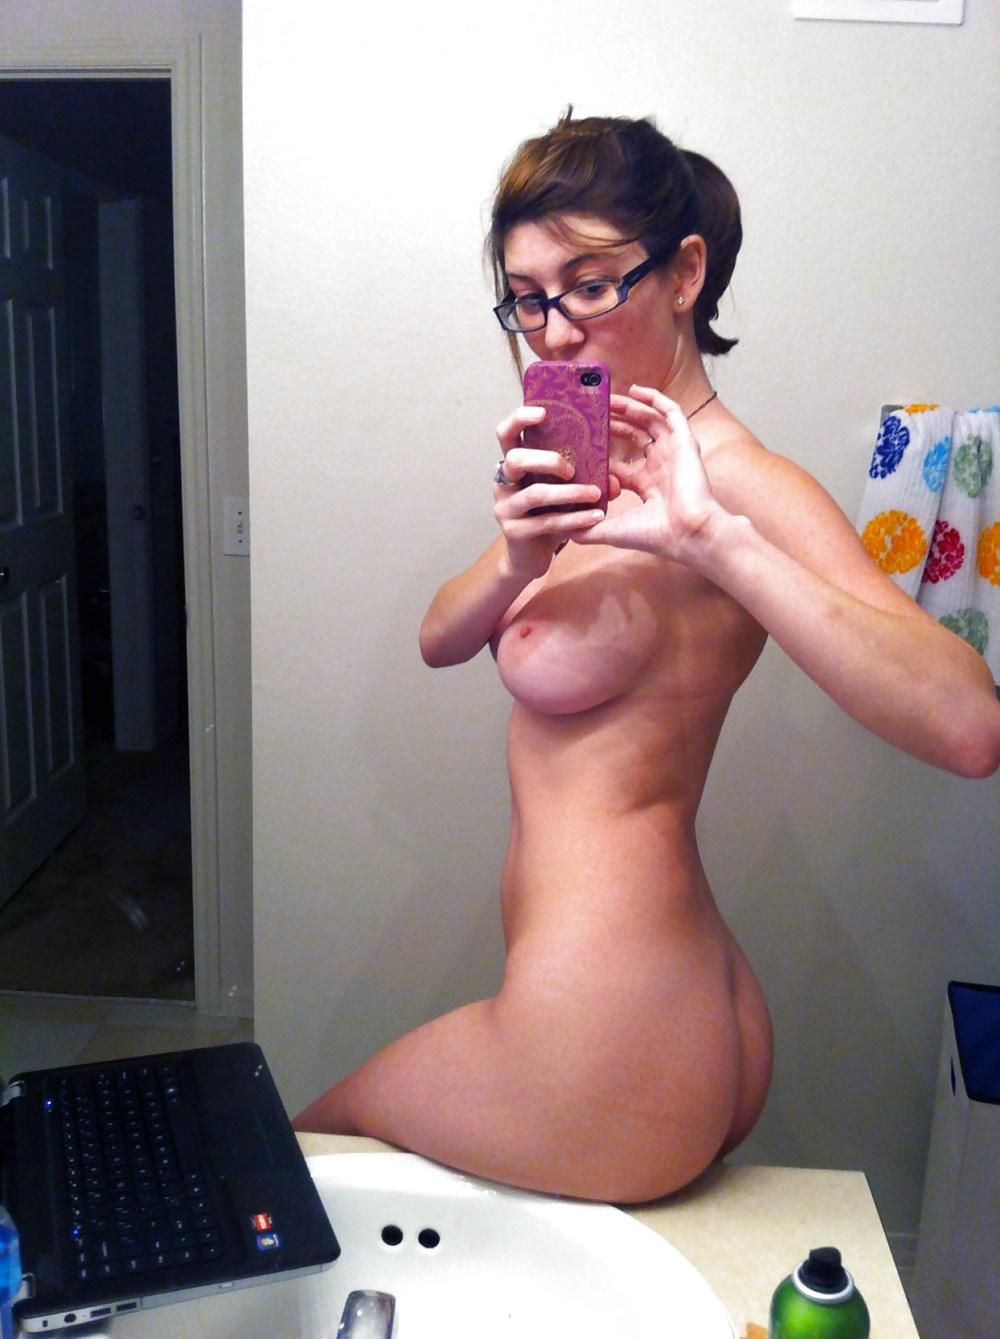 pantyhose-sex-nude-geeks-girls-selfshots